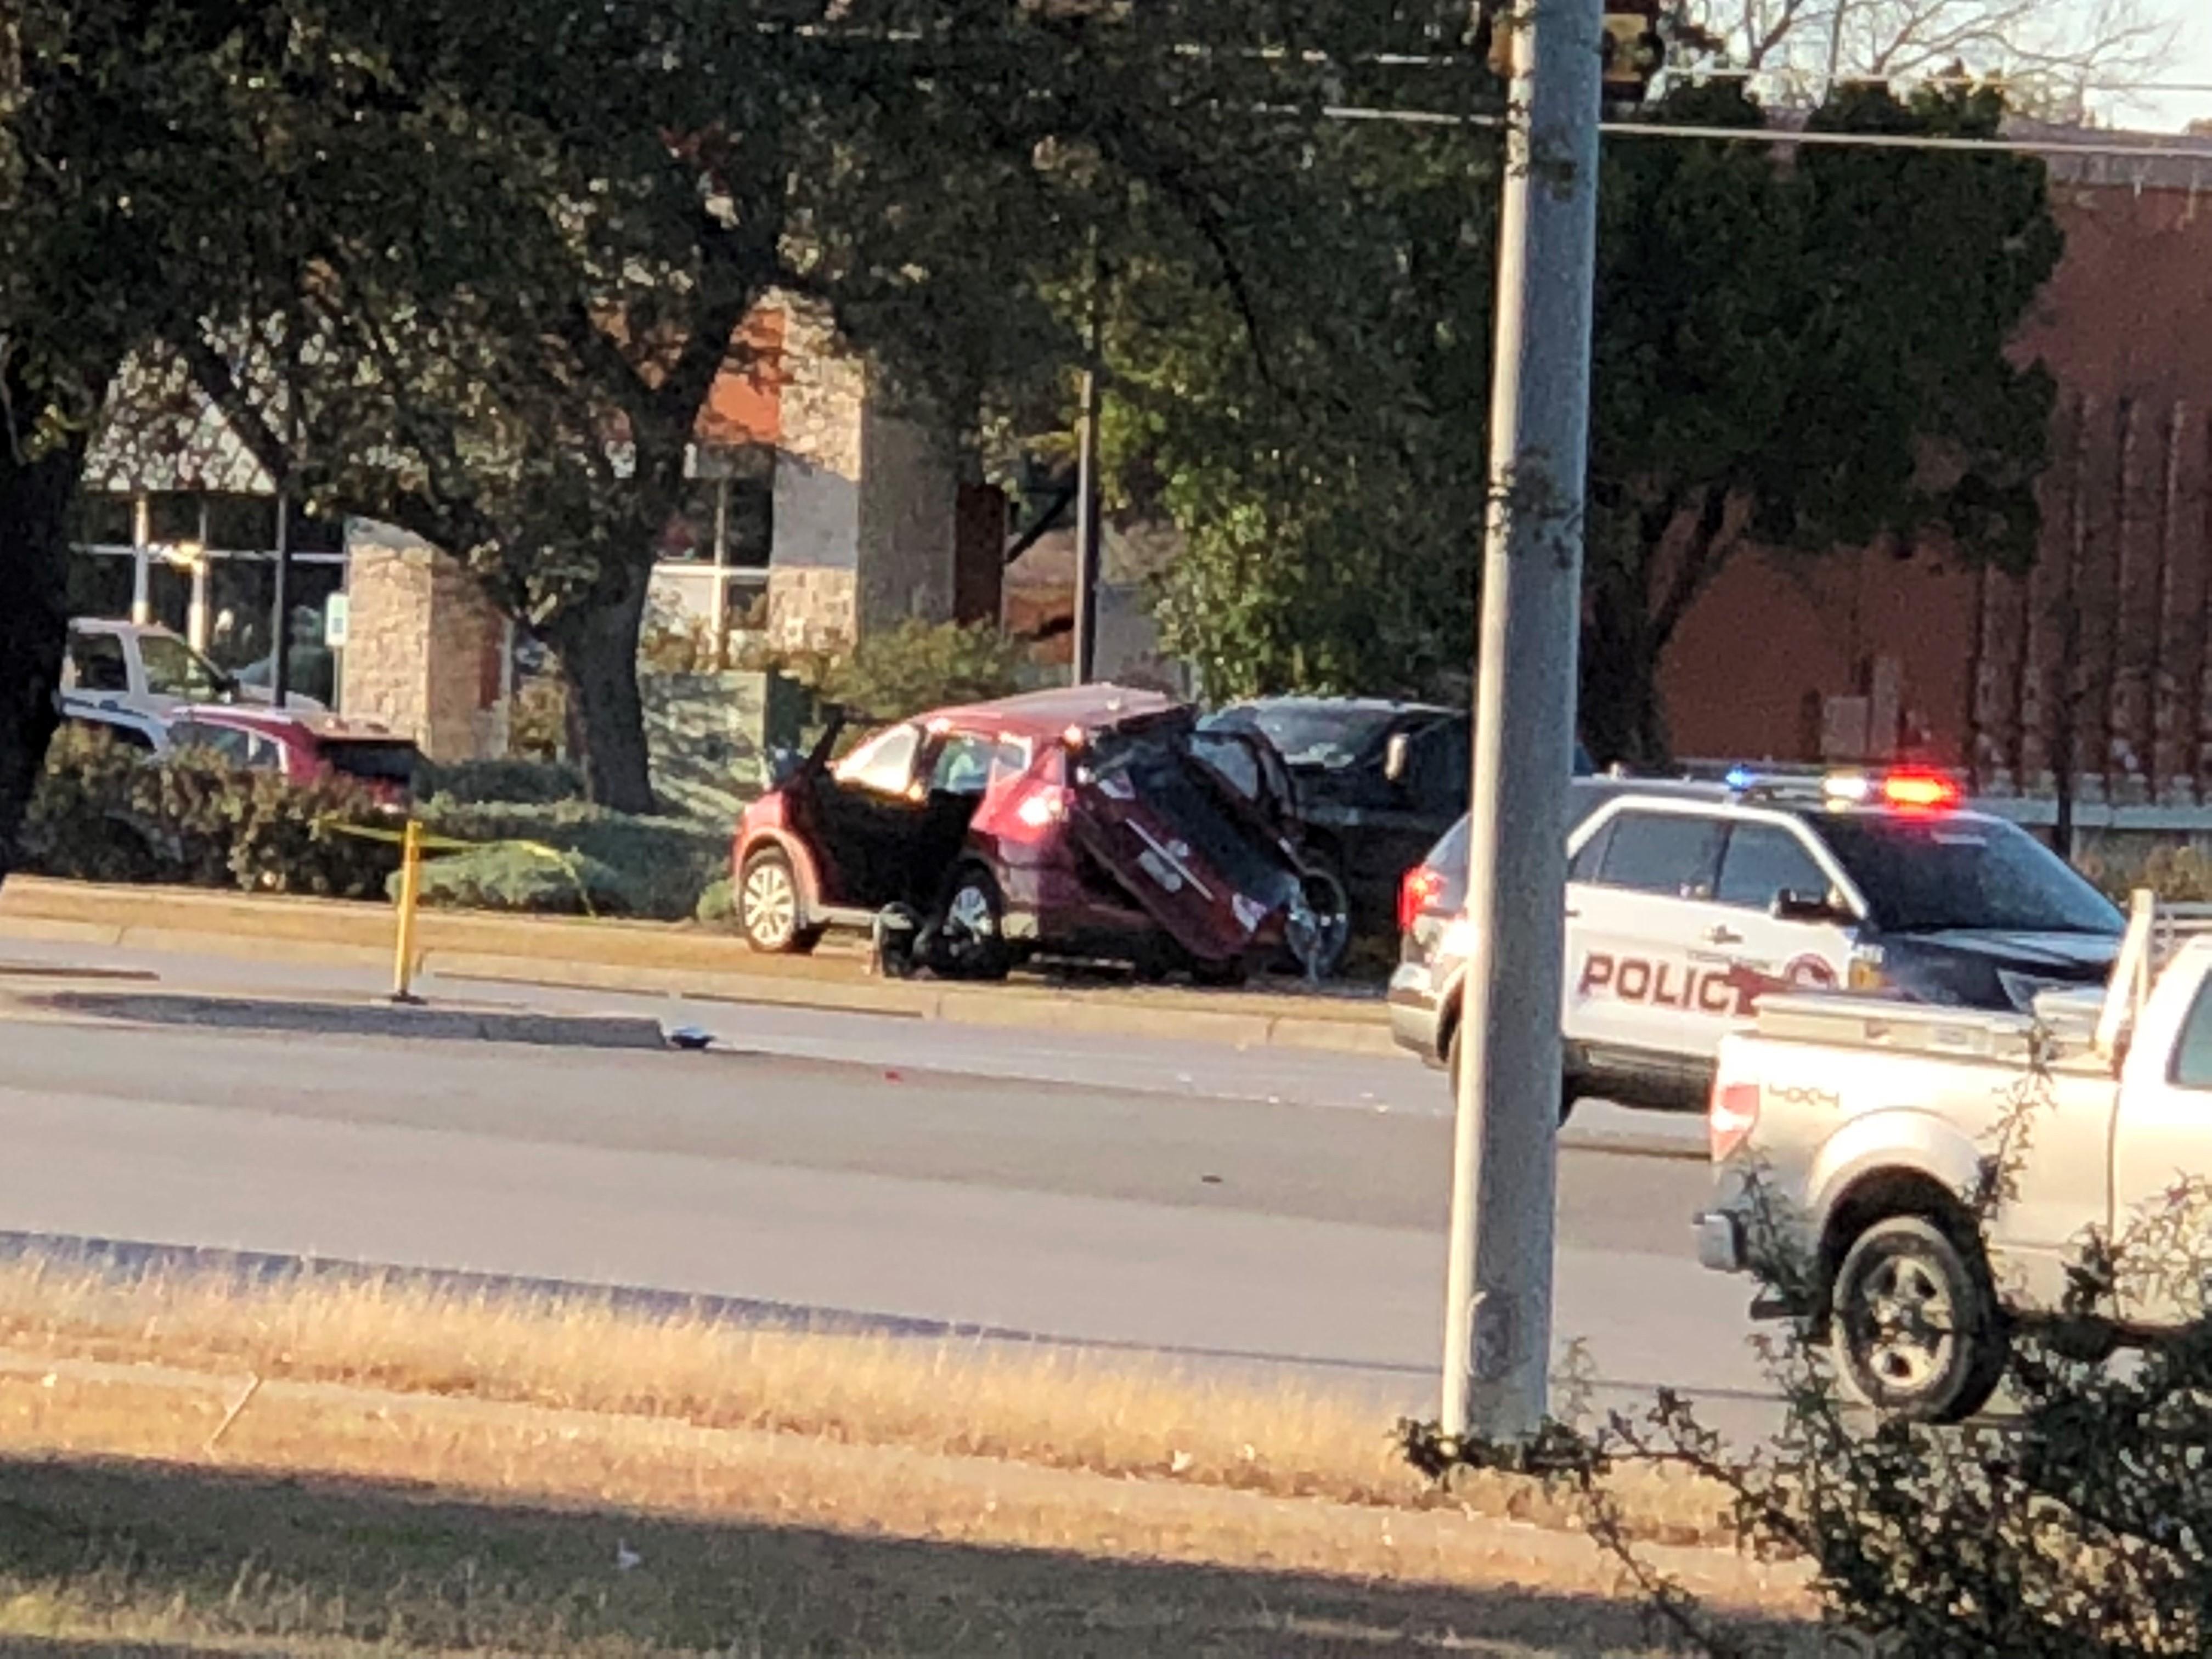 Cedar Park intersection where 2 boys died scrutinized over